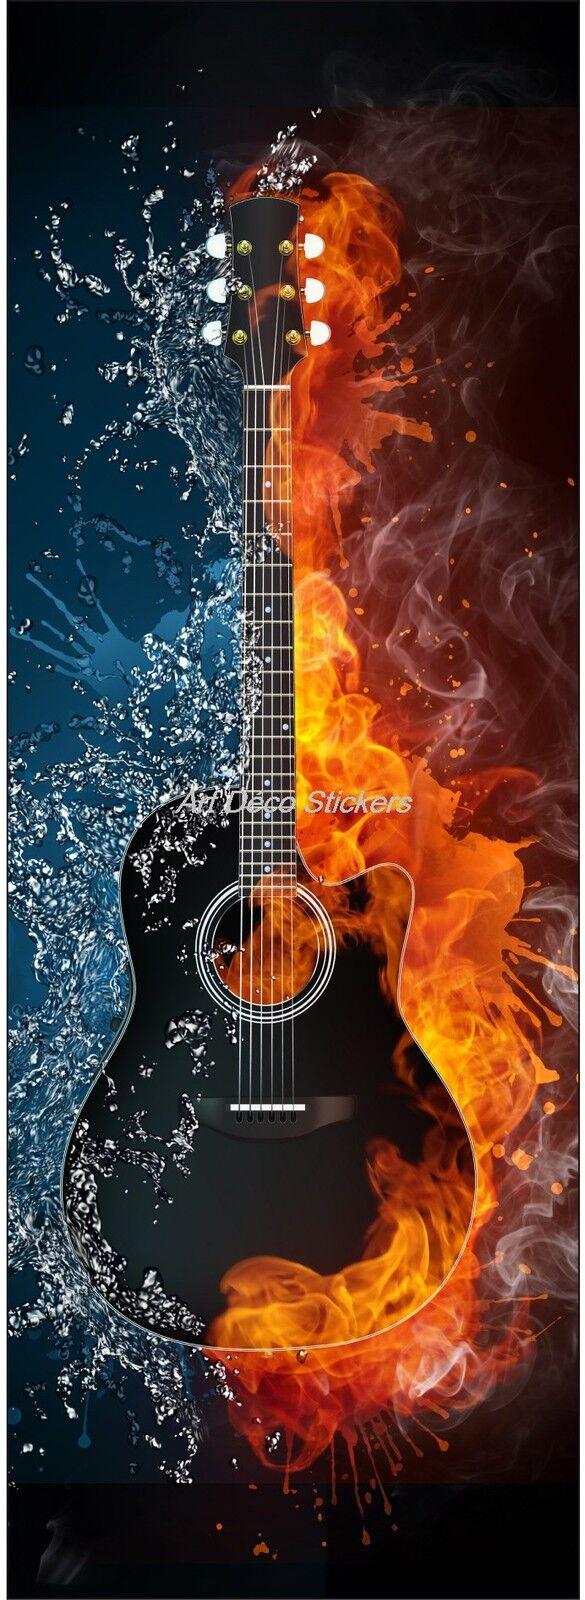 Aufkleber für Türe Täuschung Auge Deko Gitarre ( Geige - C'Est Un Violon) Ref